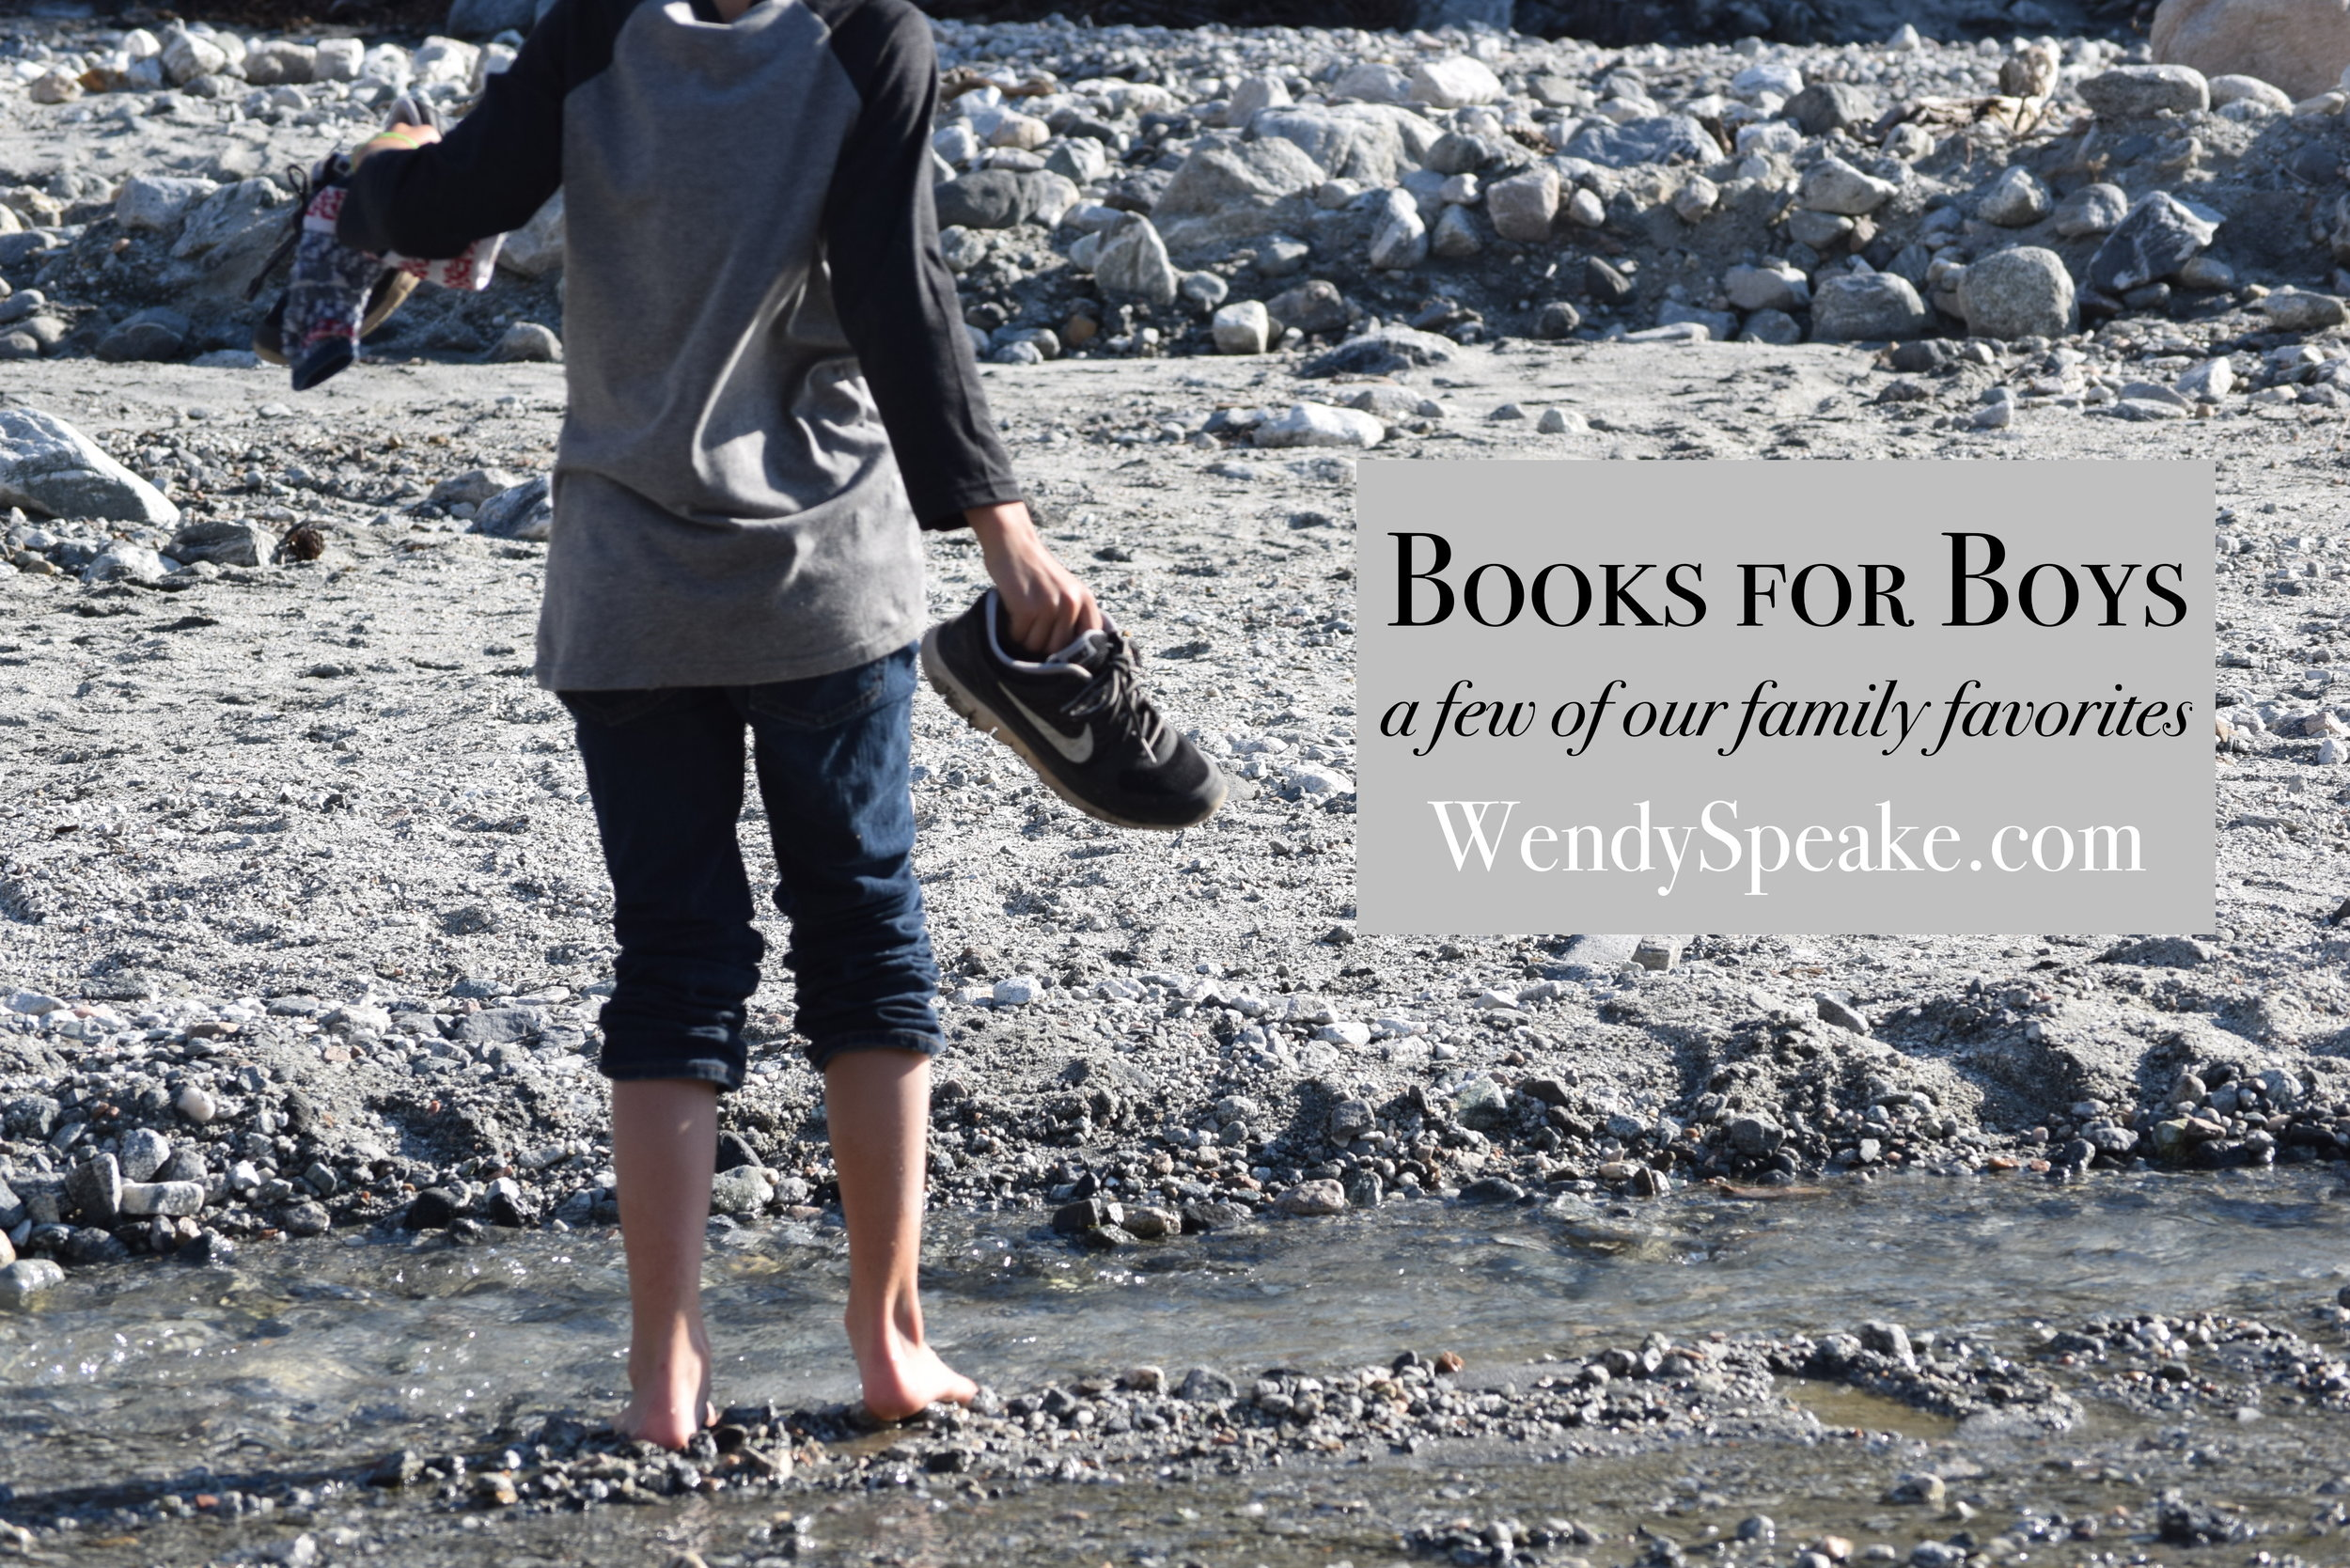 booksforboys-graphic.jpeg